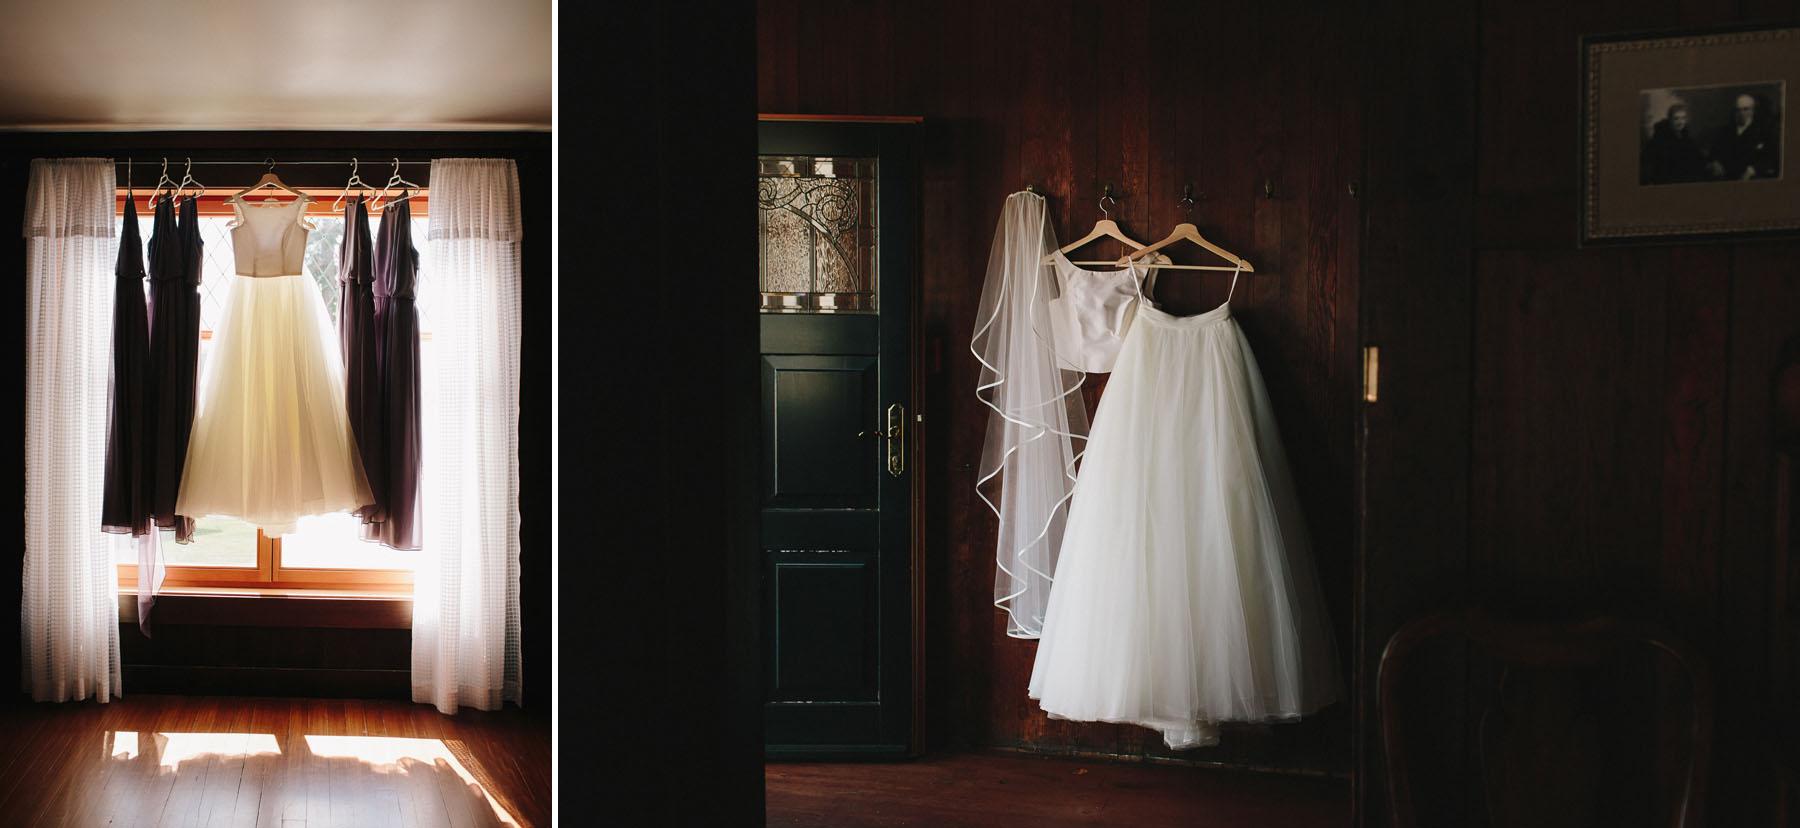 thetis-island-wedding-photographer-rp-rn-003.jpg